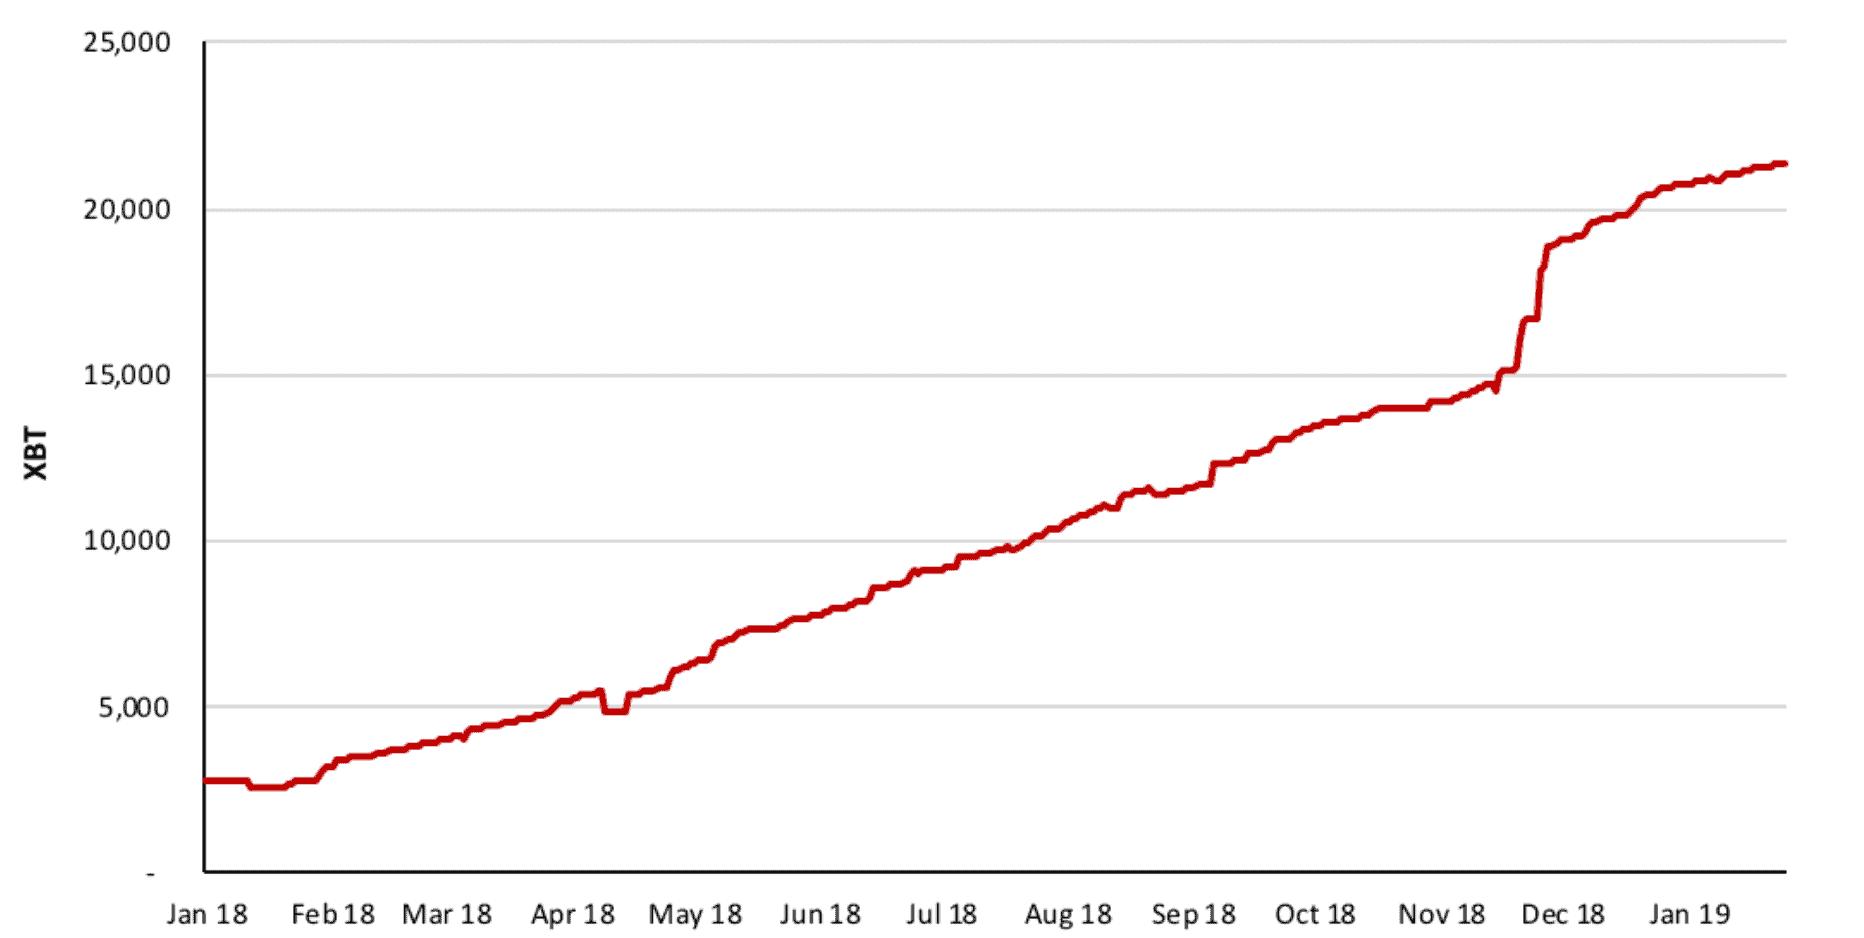 BitMEX insurance fund volume